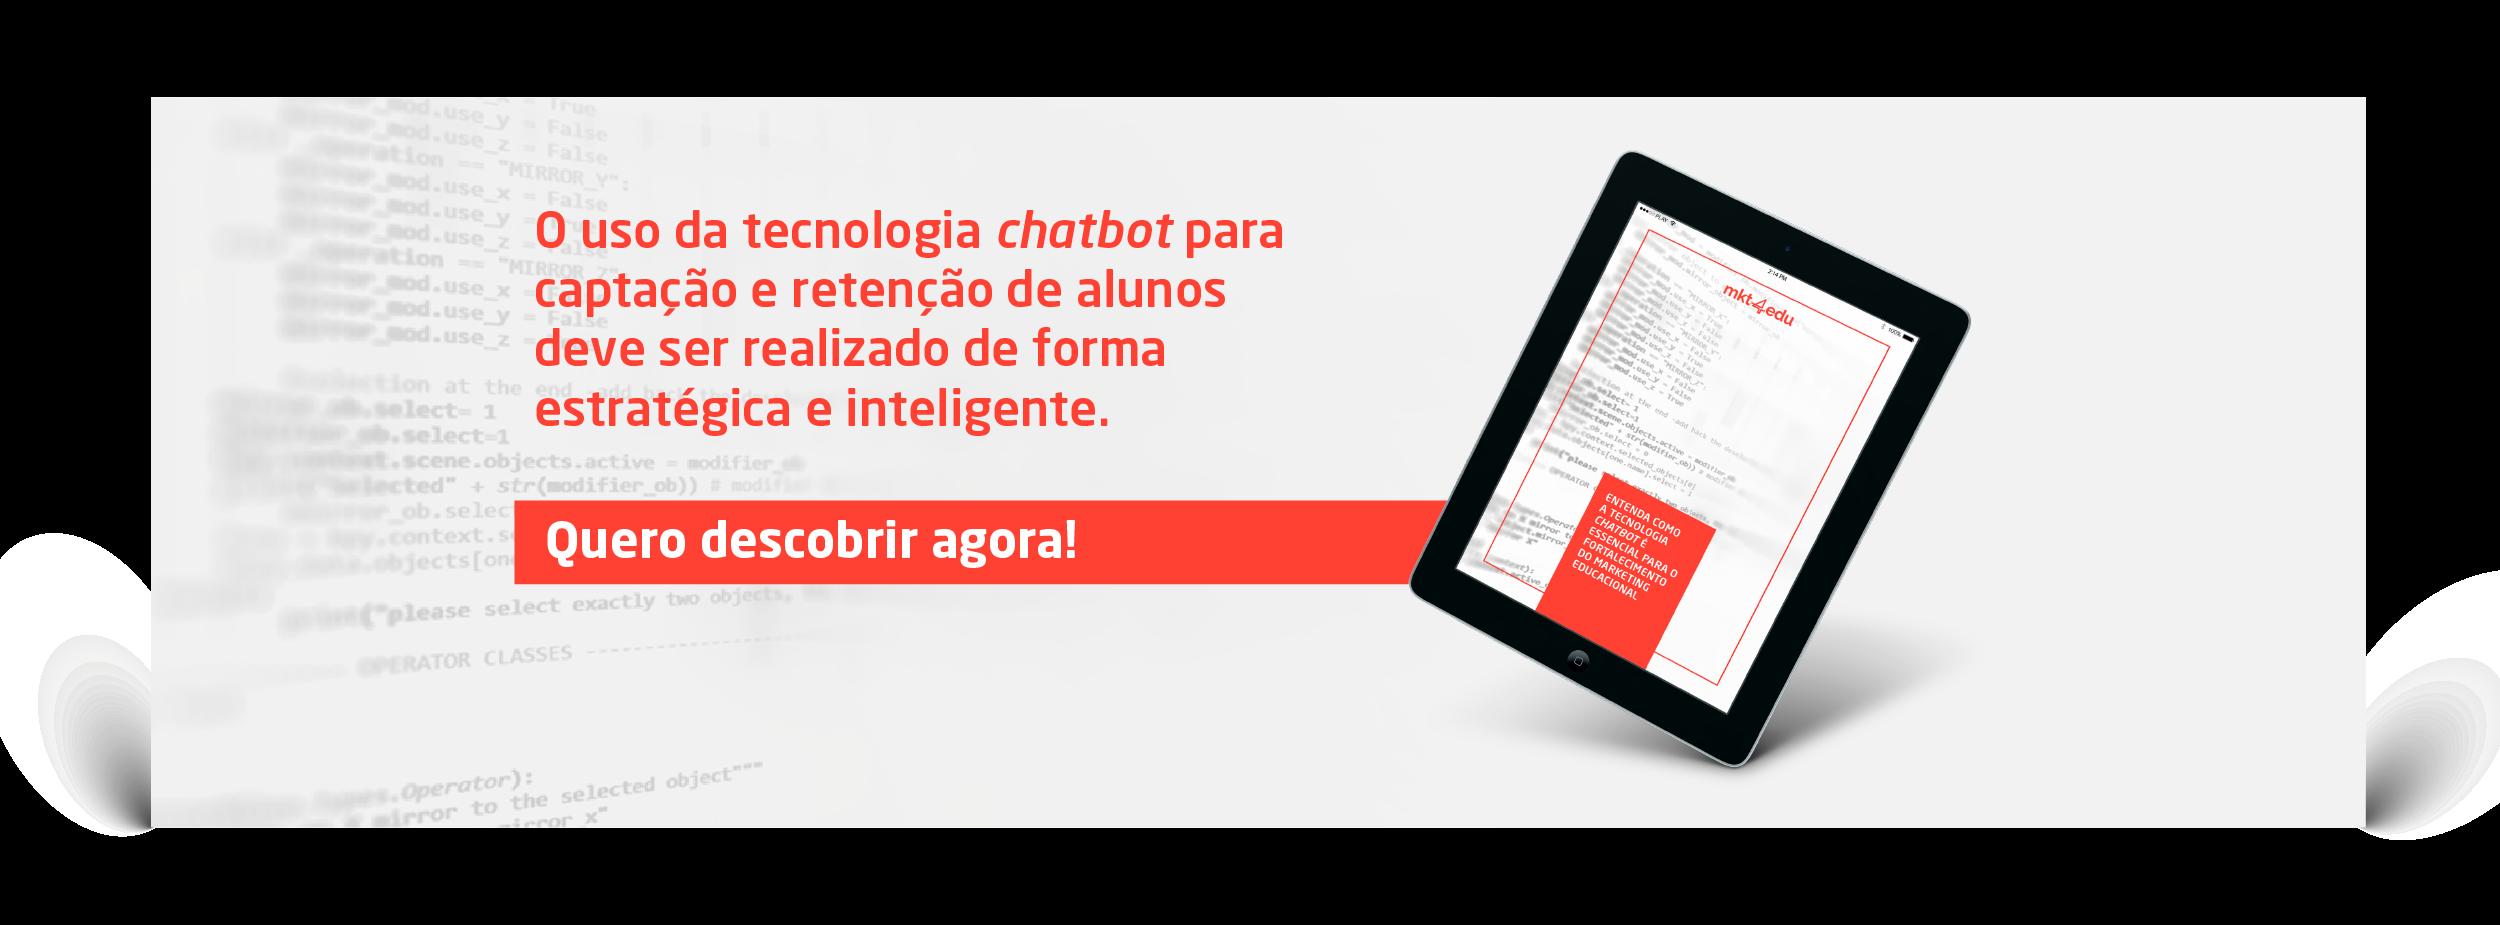 Tecnologia chatbot no marketing educacional